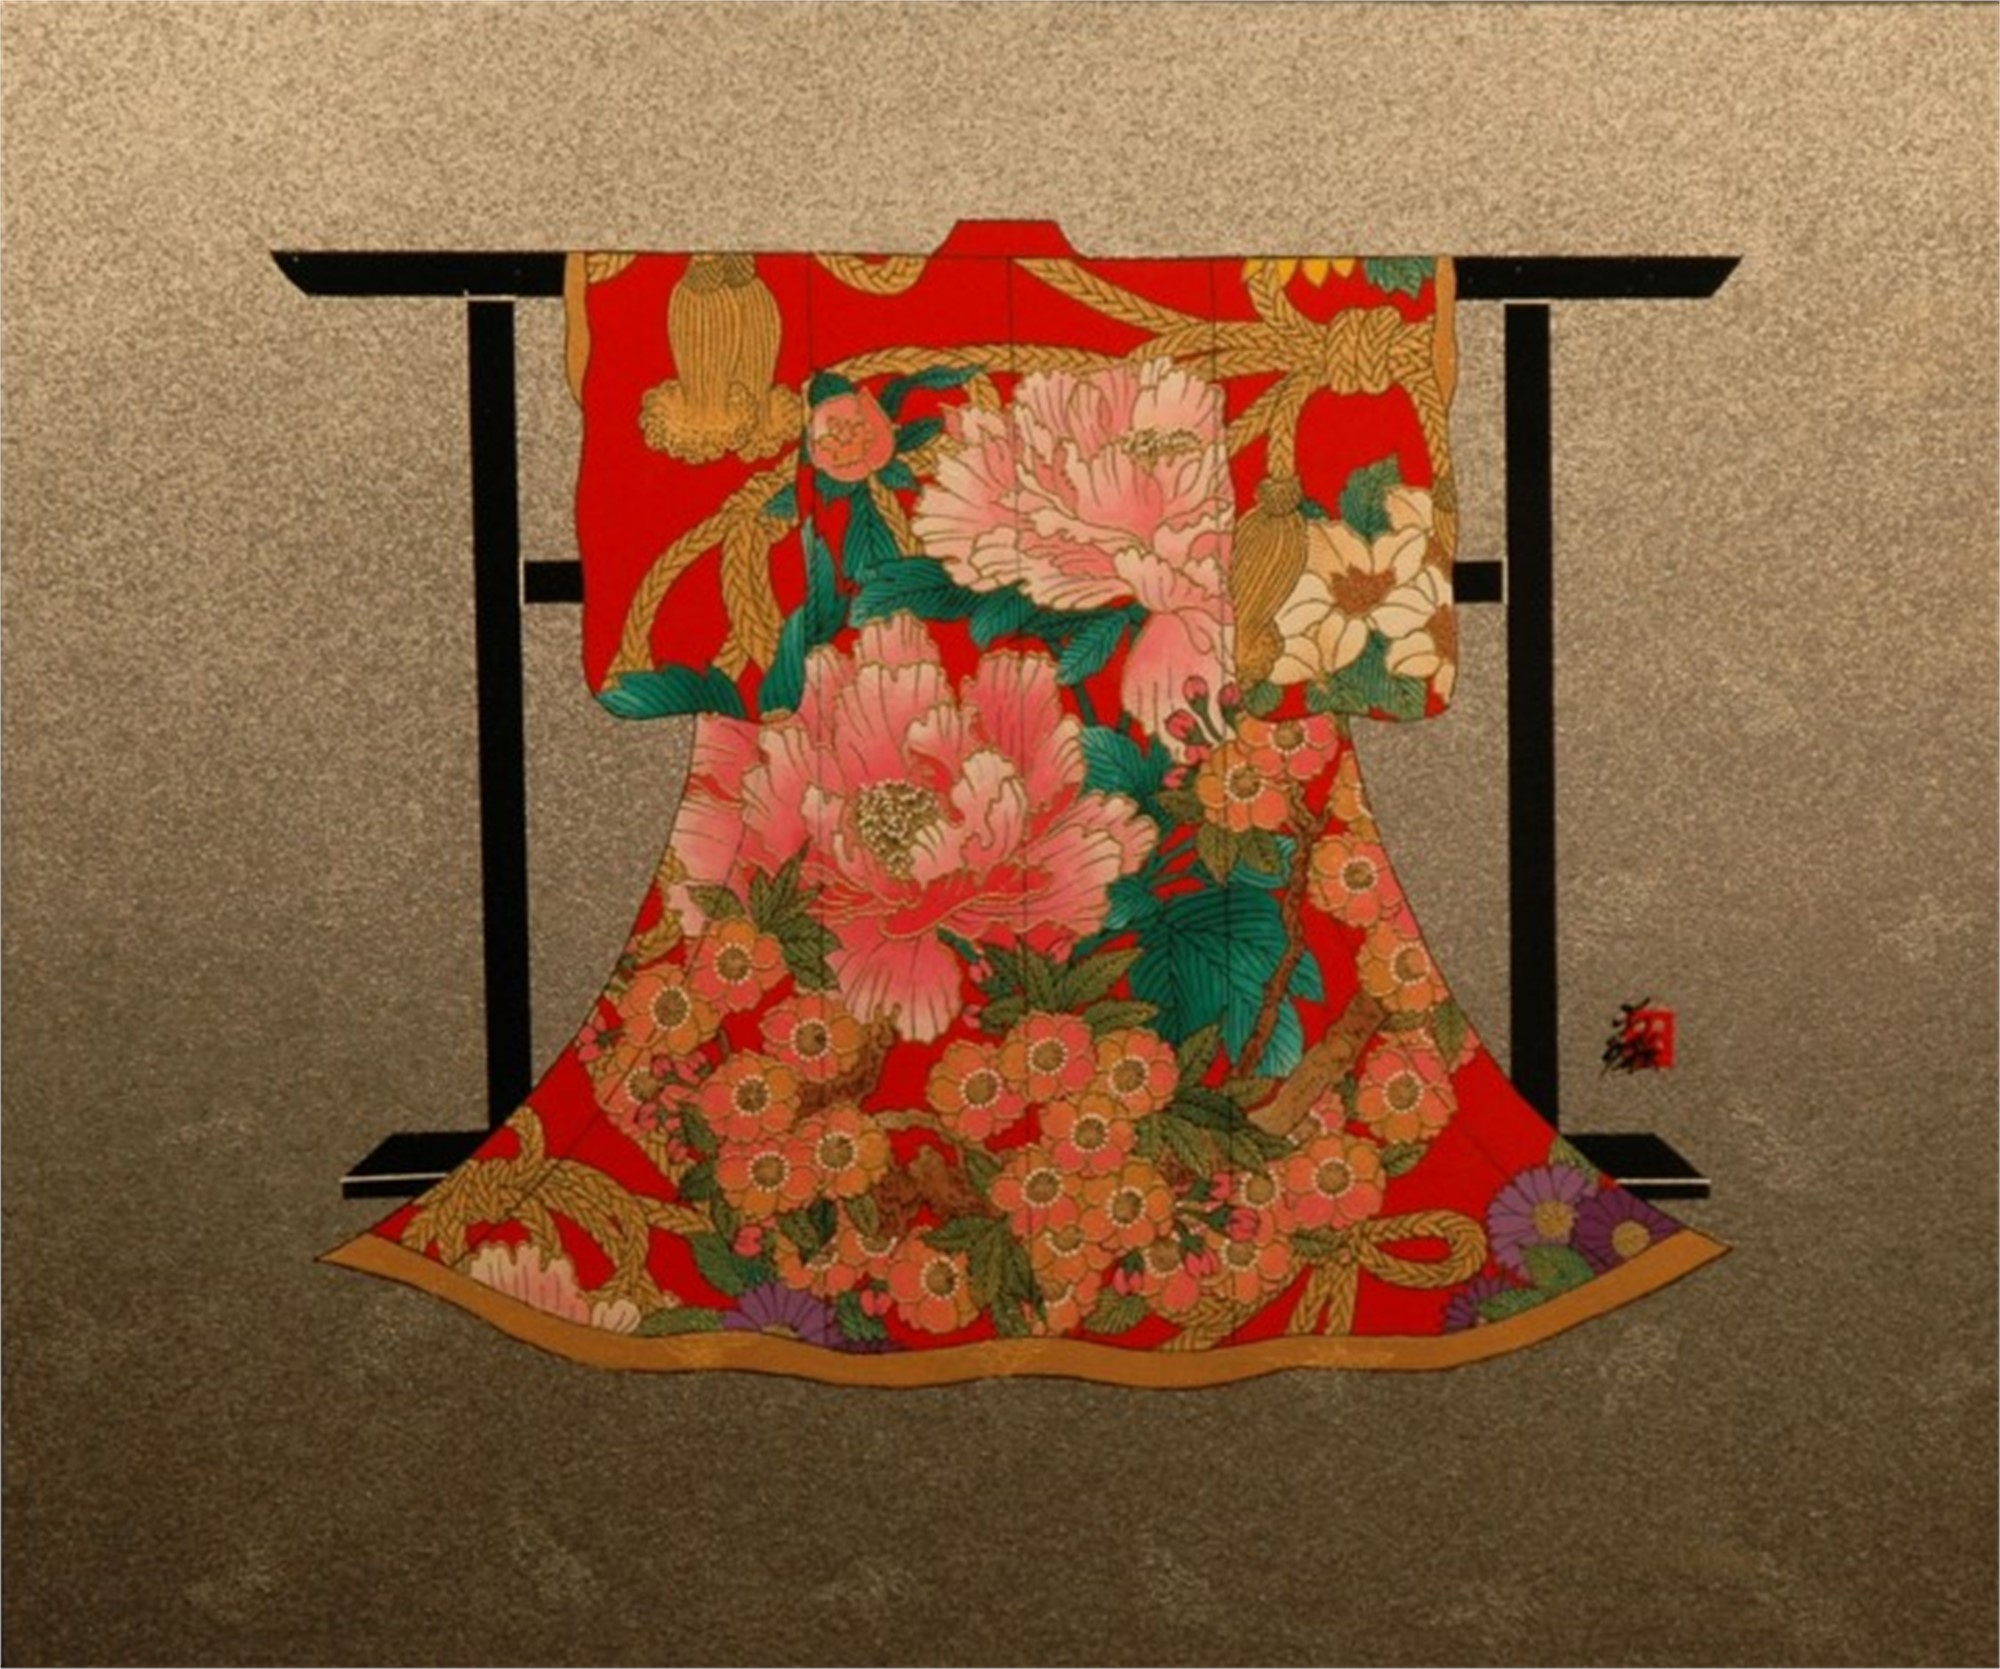 Spring Kimono by Hisashi Otsuka